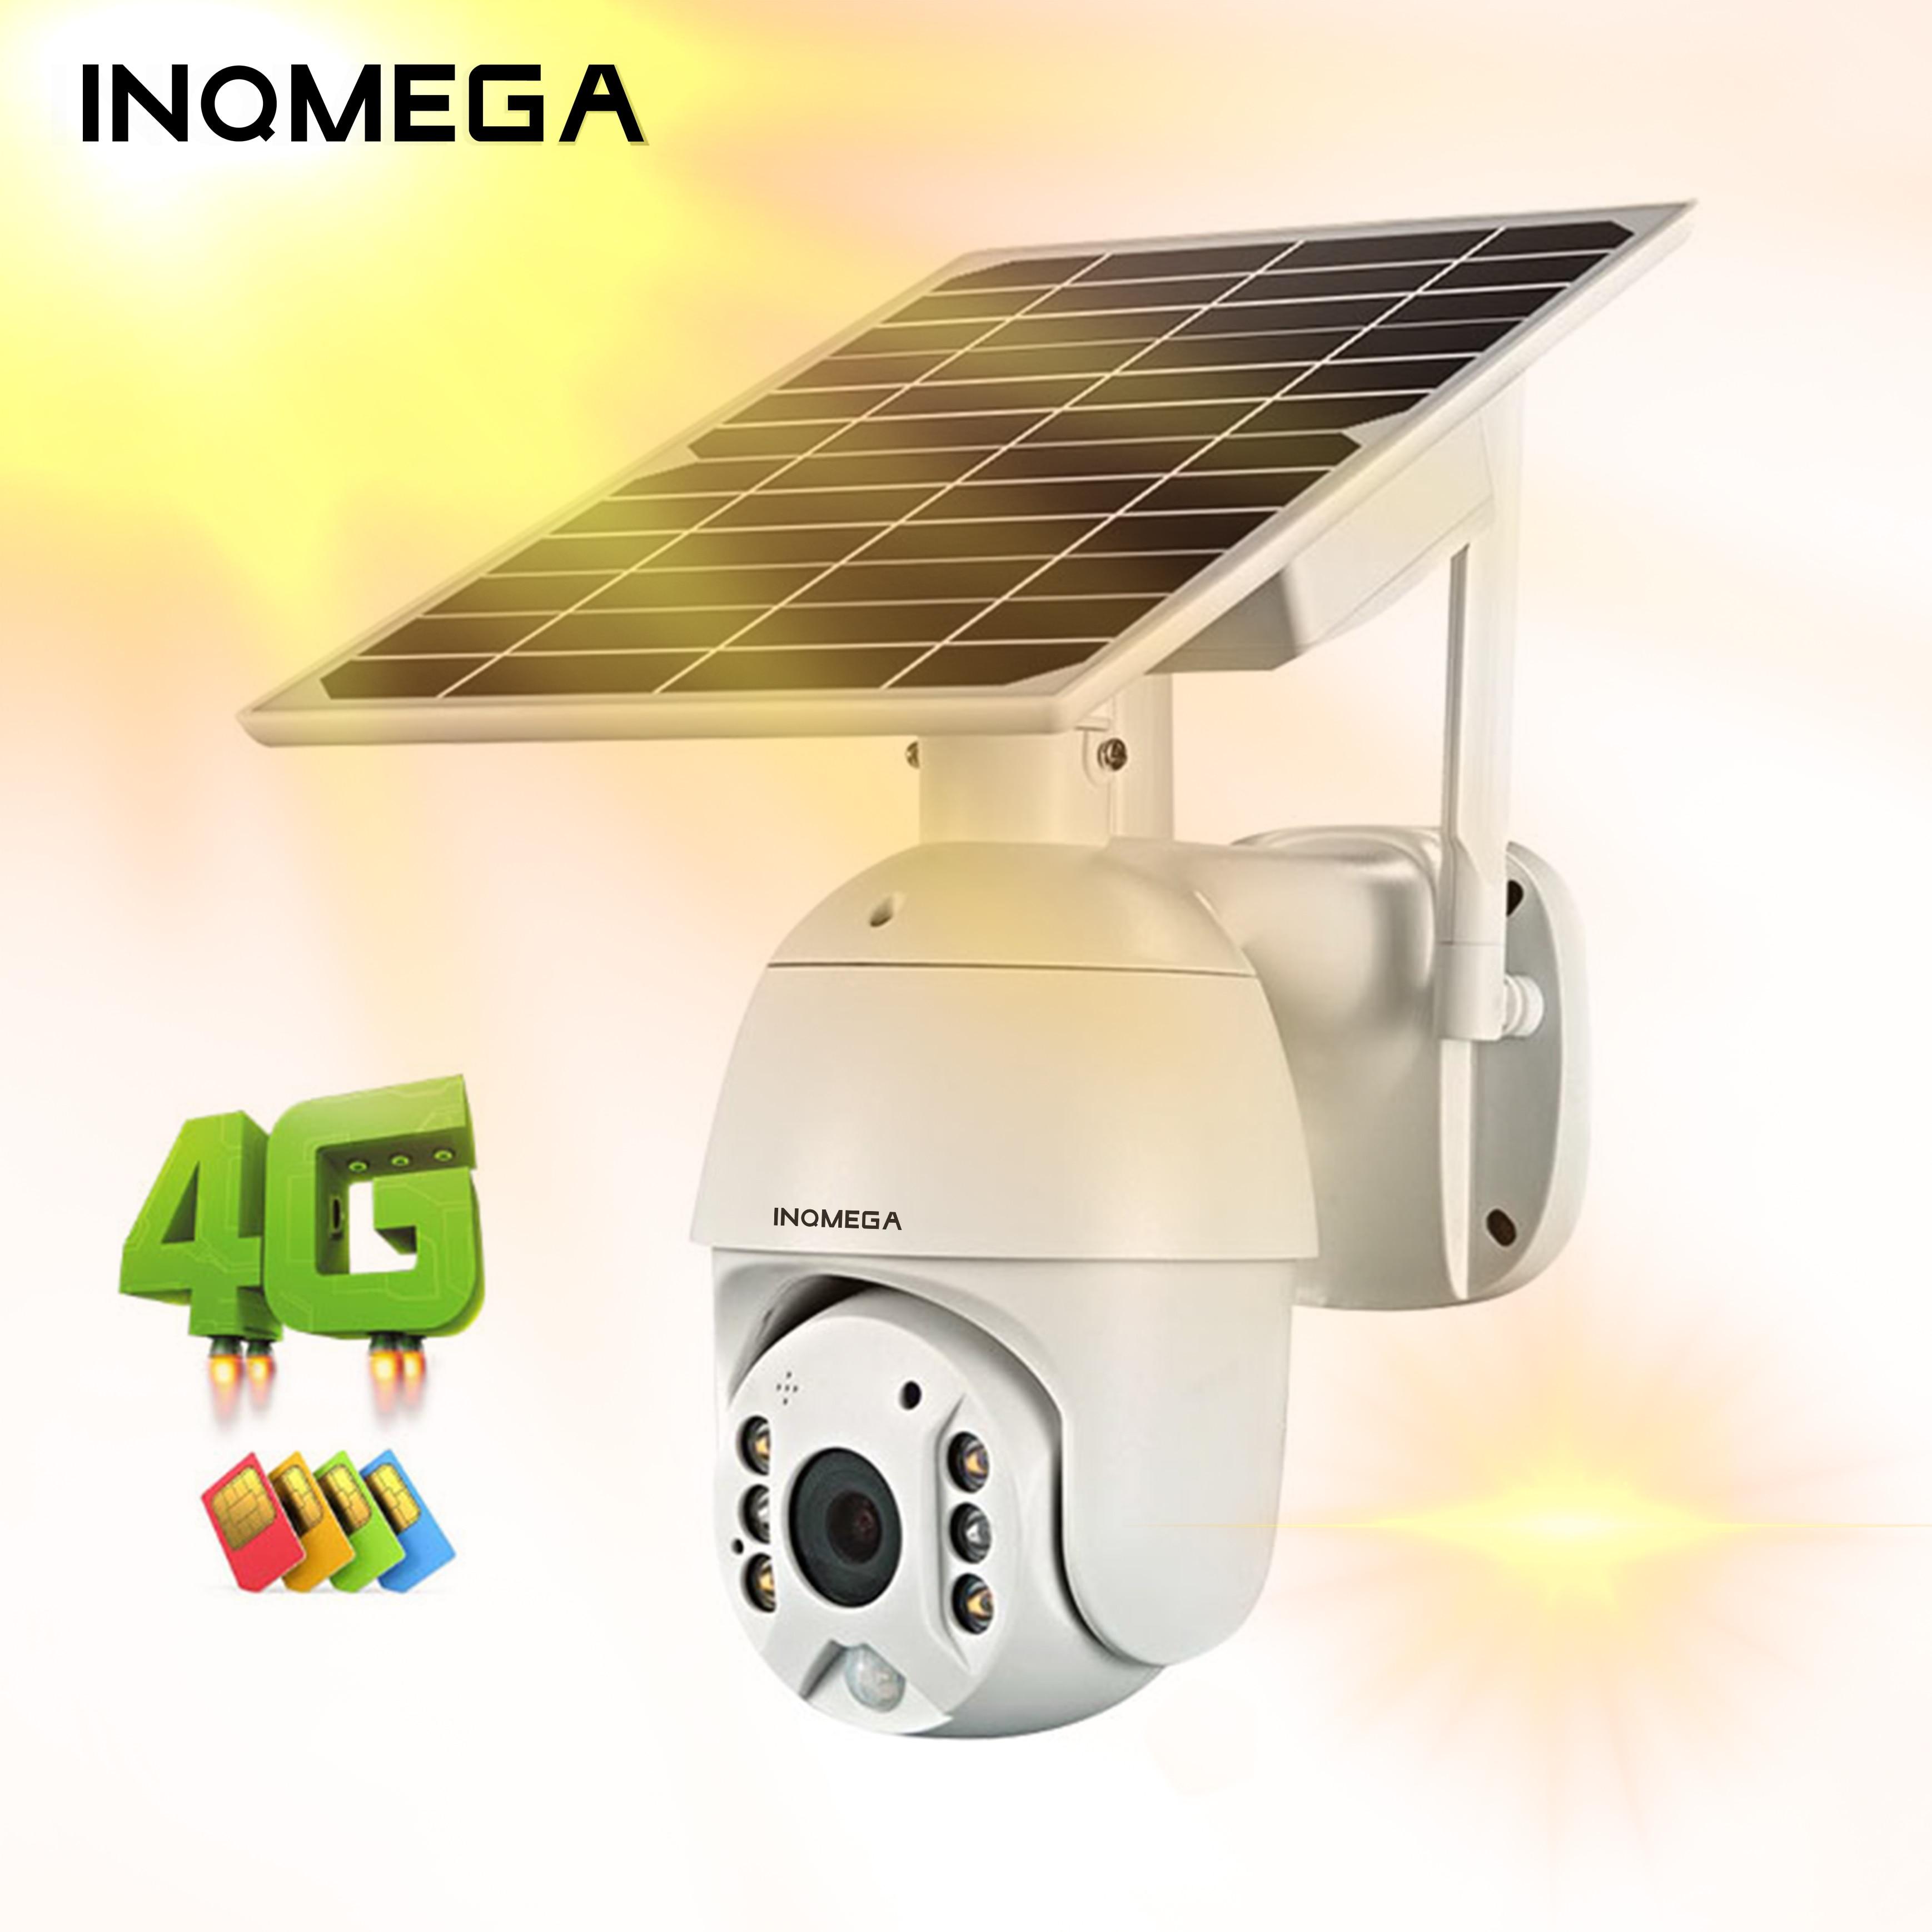 INQMEGA WIFI 4G Solar IP PTZ Cameras Starlight Full Color IR Vision P2P 4G Sim Card IR Vision Dome Camera Cloud Storage Camera